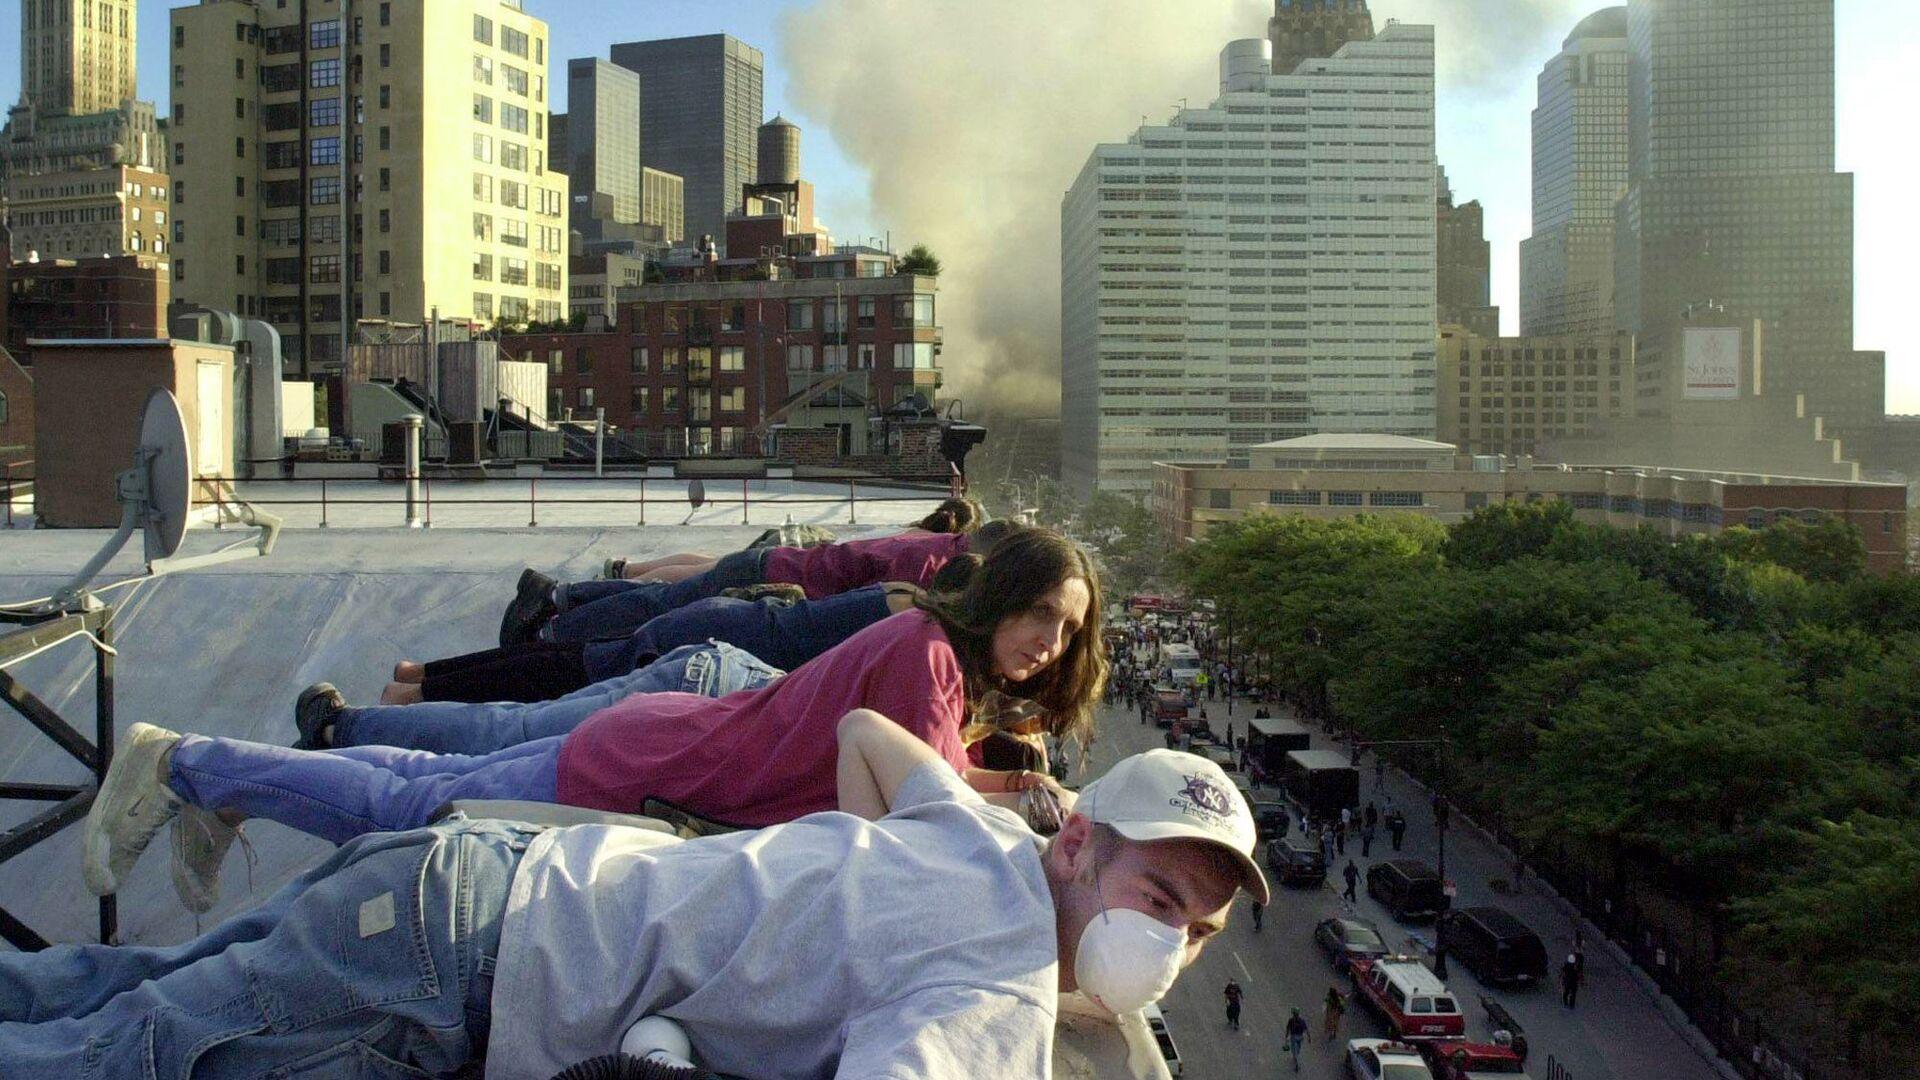 Люди на крыше дома во время теракта в Нью-Йорке  - Sputnik Արմենիա, 1920, 28.09.2021